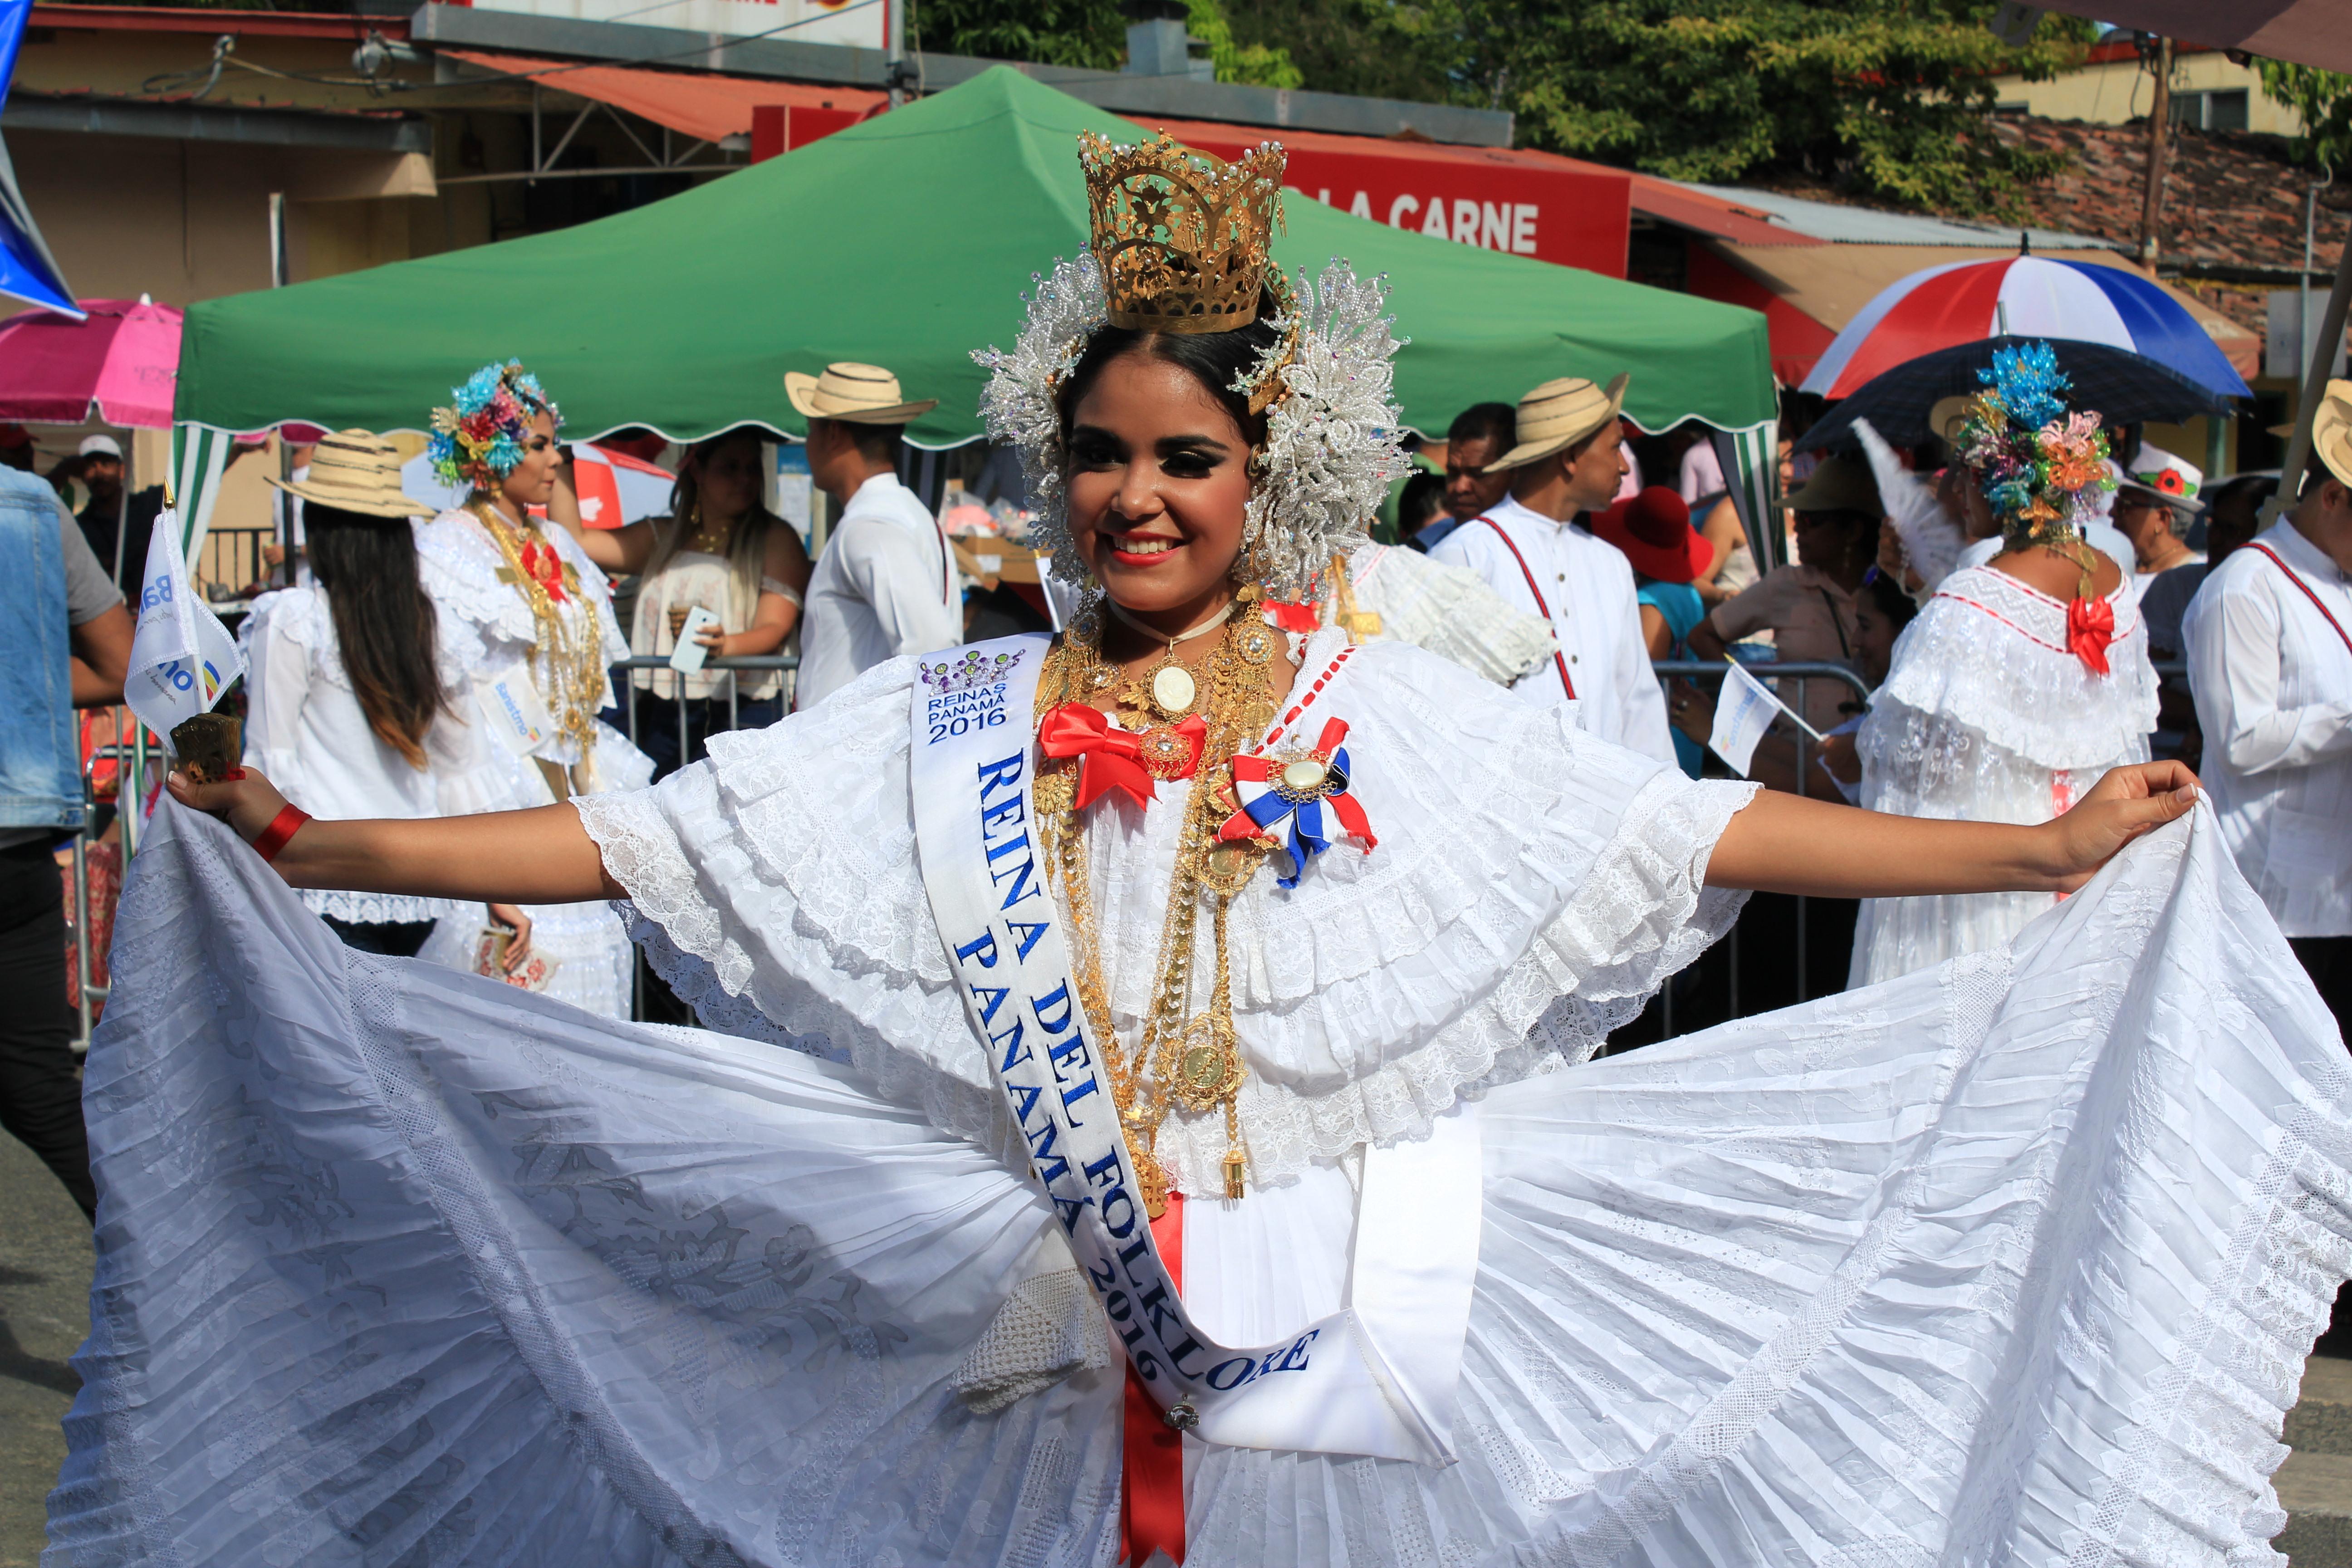 lovely-pollera-8 A Panama Road Trip Panama Panama Fairs and Festivals